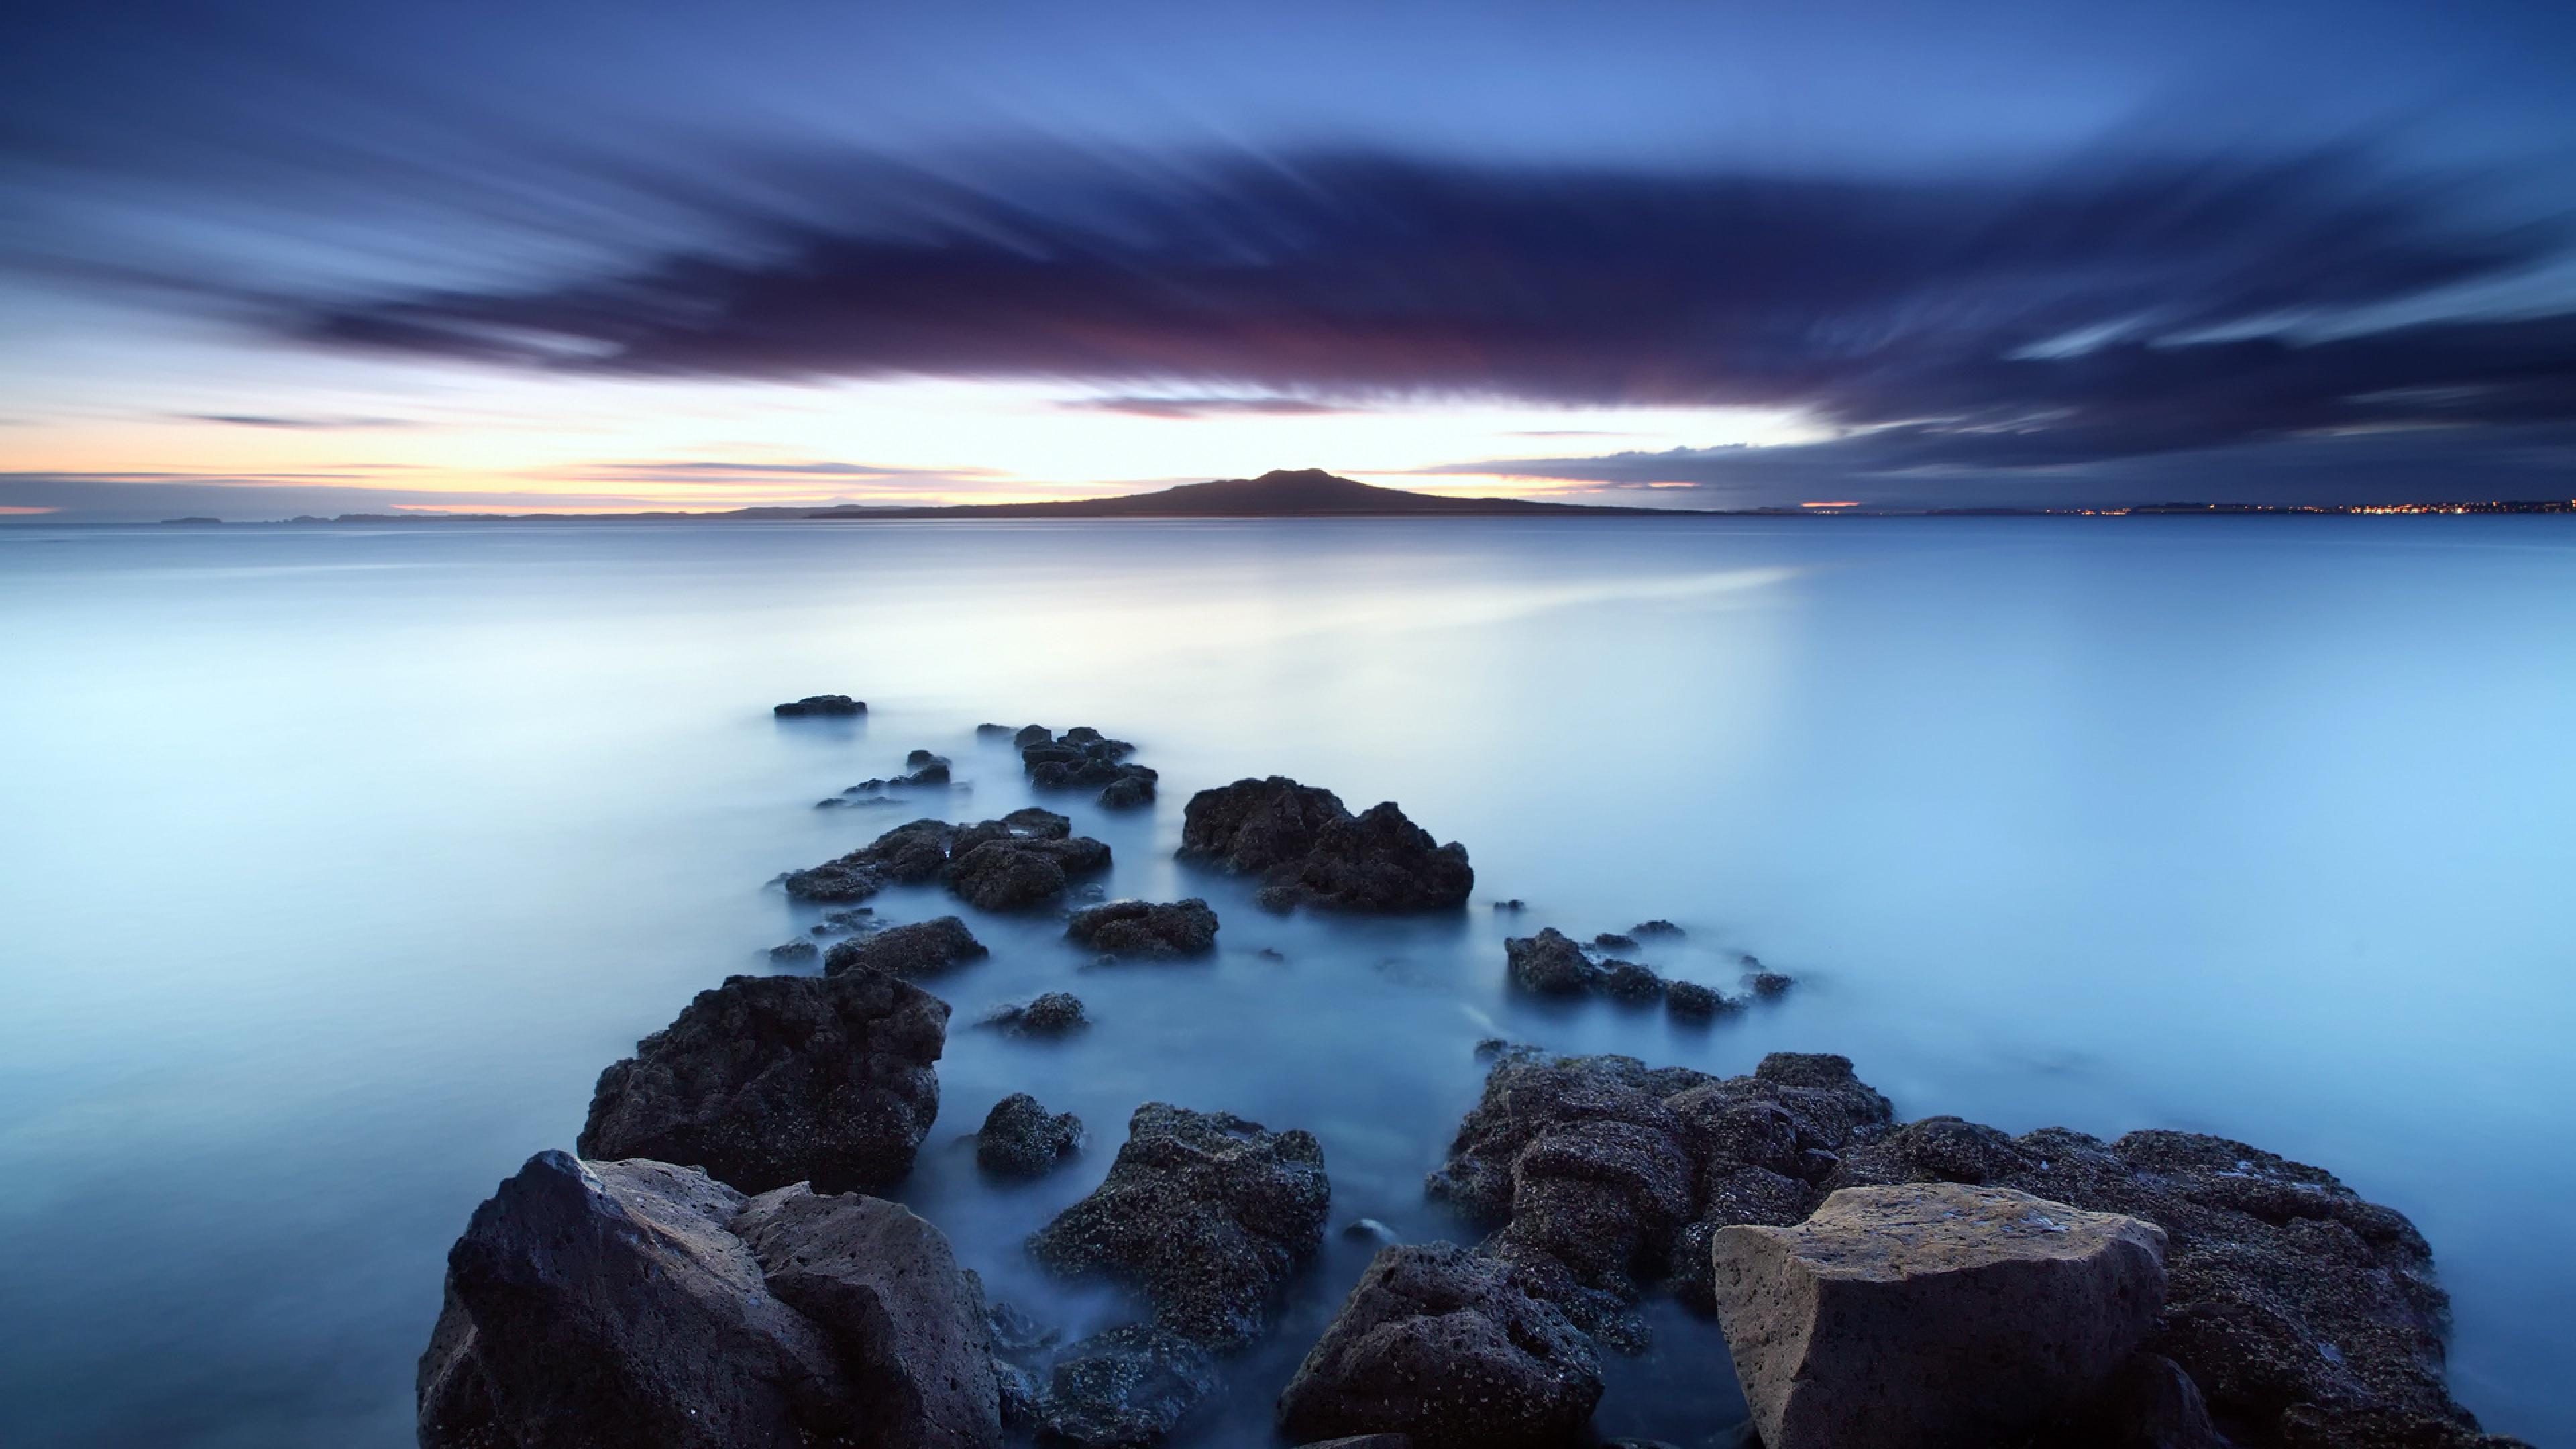 coast_stones_sea_water_sky_mountain_island_ultra_3840x2160_hd-wallpaper-149153